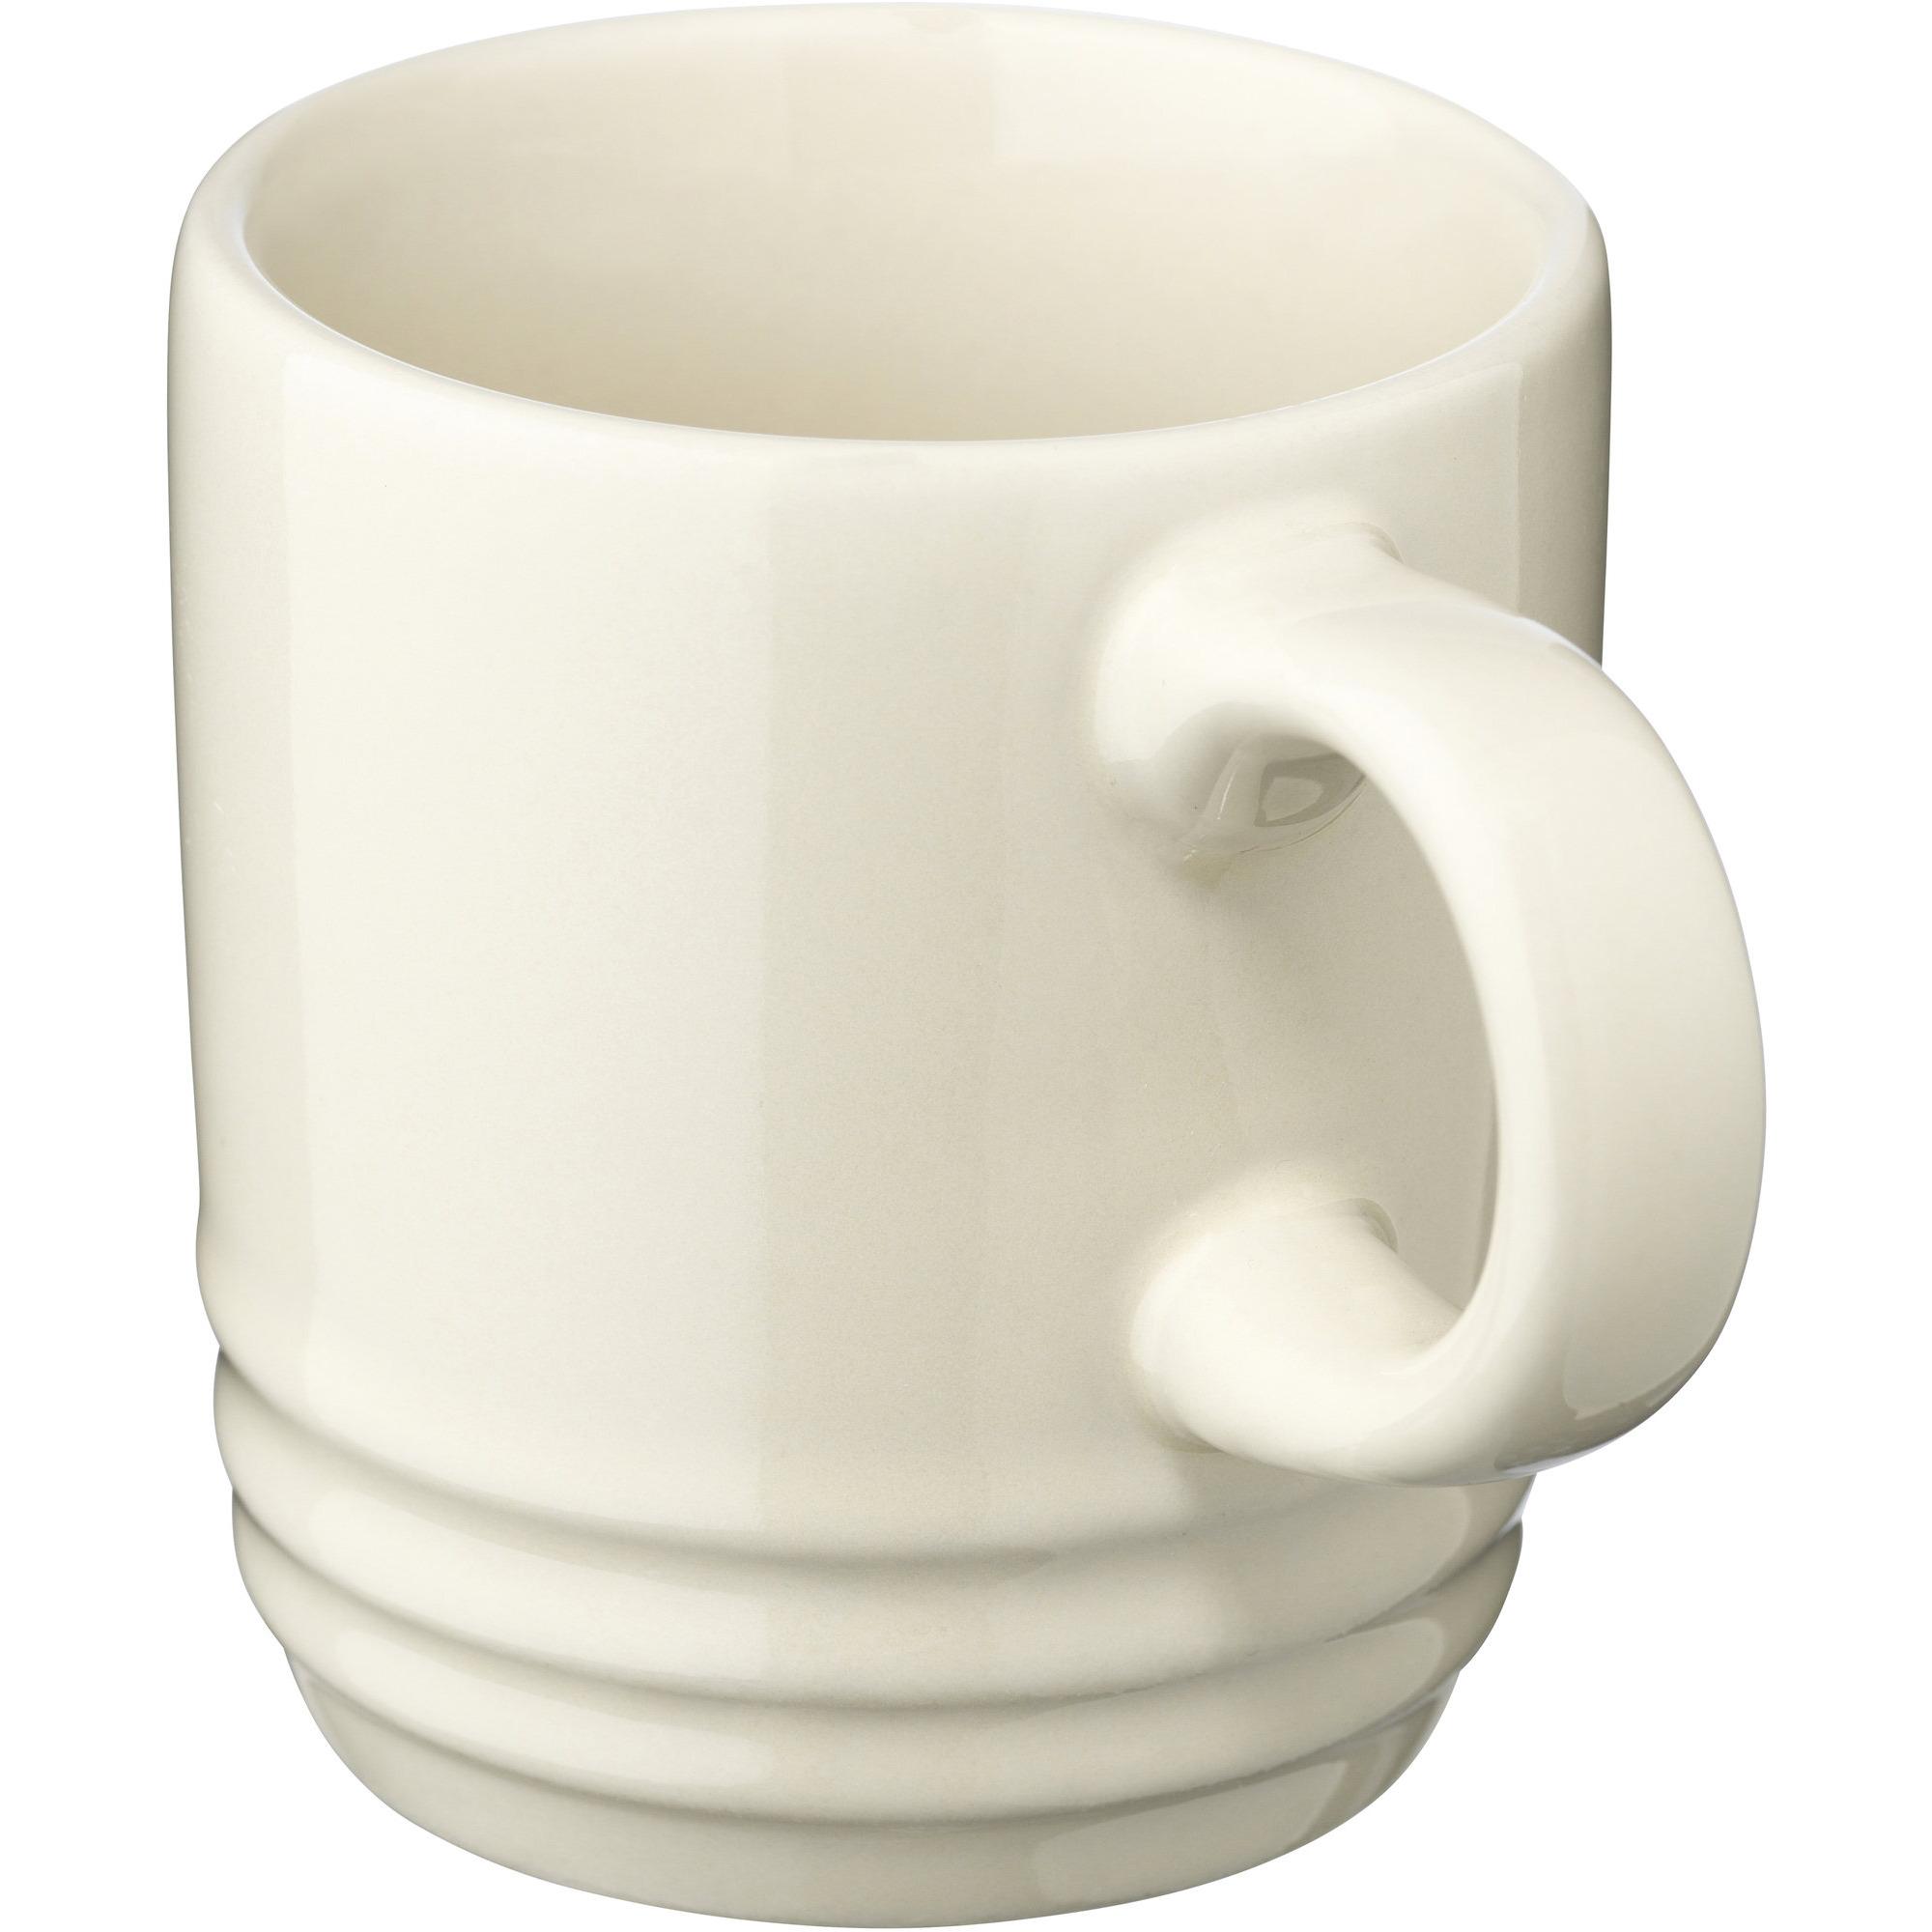 Le Creuset Espressokopp 70 ml Creme